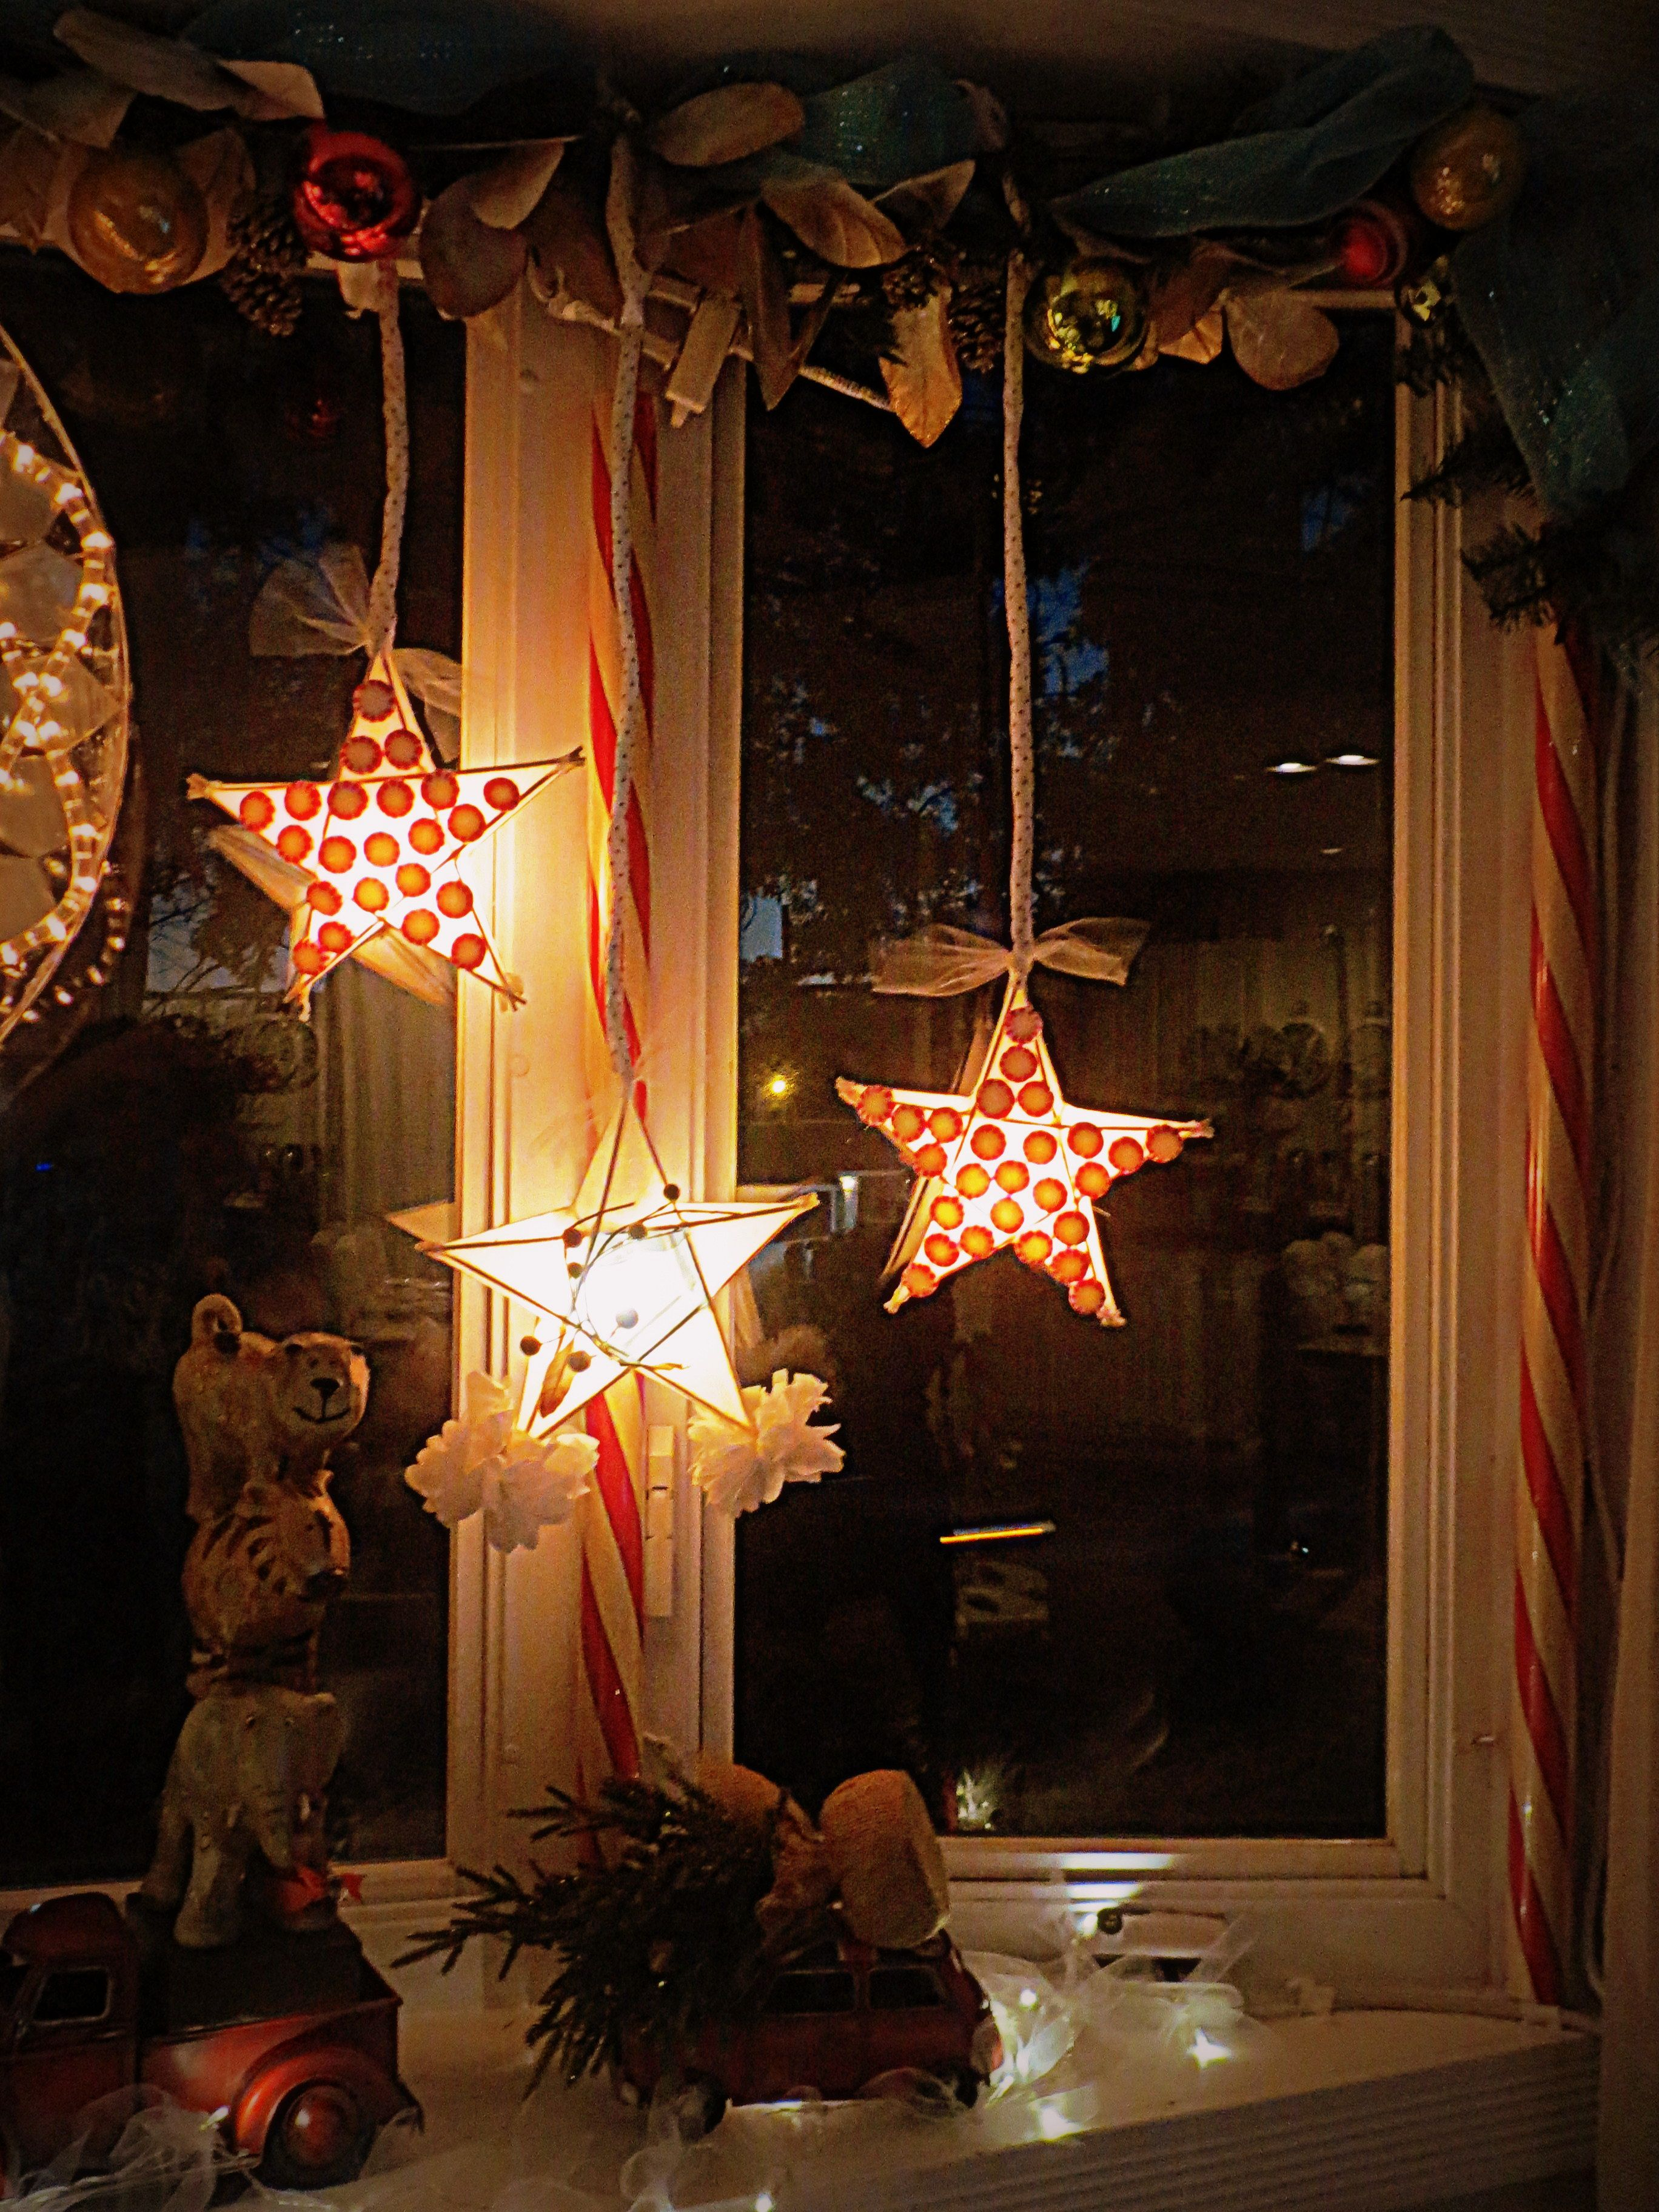 Filipino parol for sale in america - Diy Christmas Lanterns Filipino Parol I Used Bbq Sticks To Make The Stars